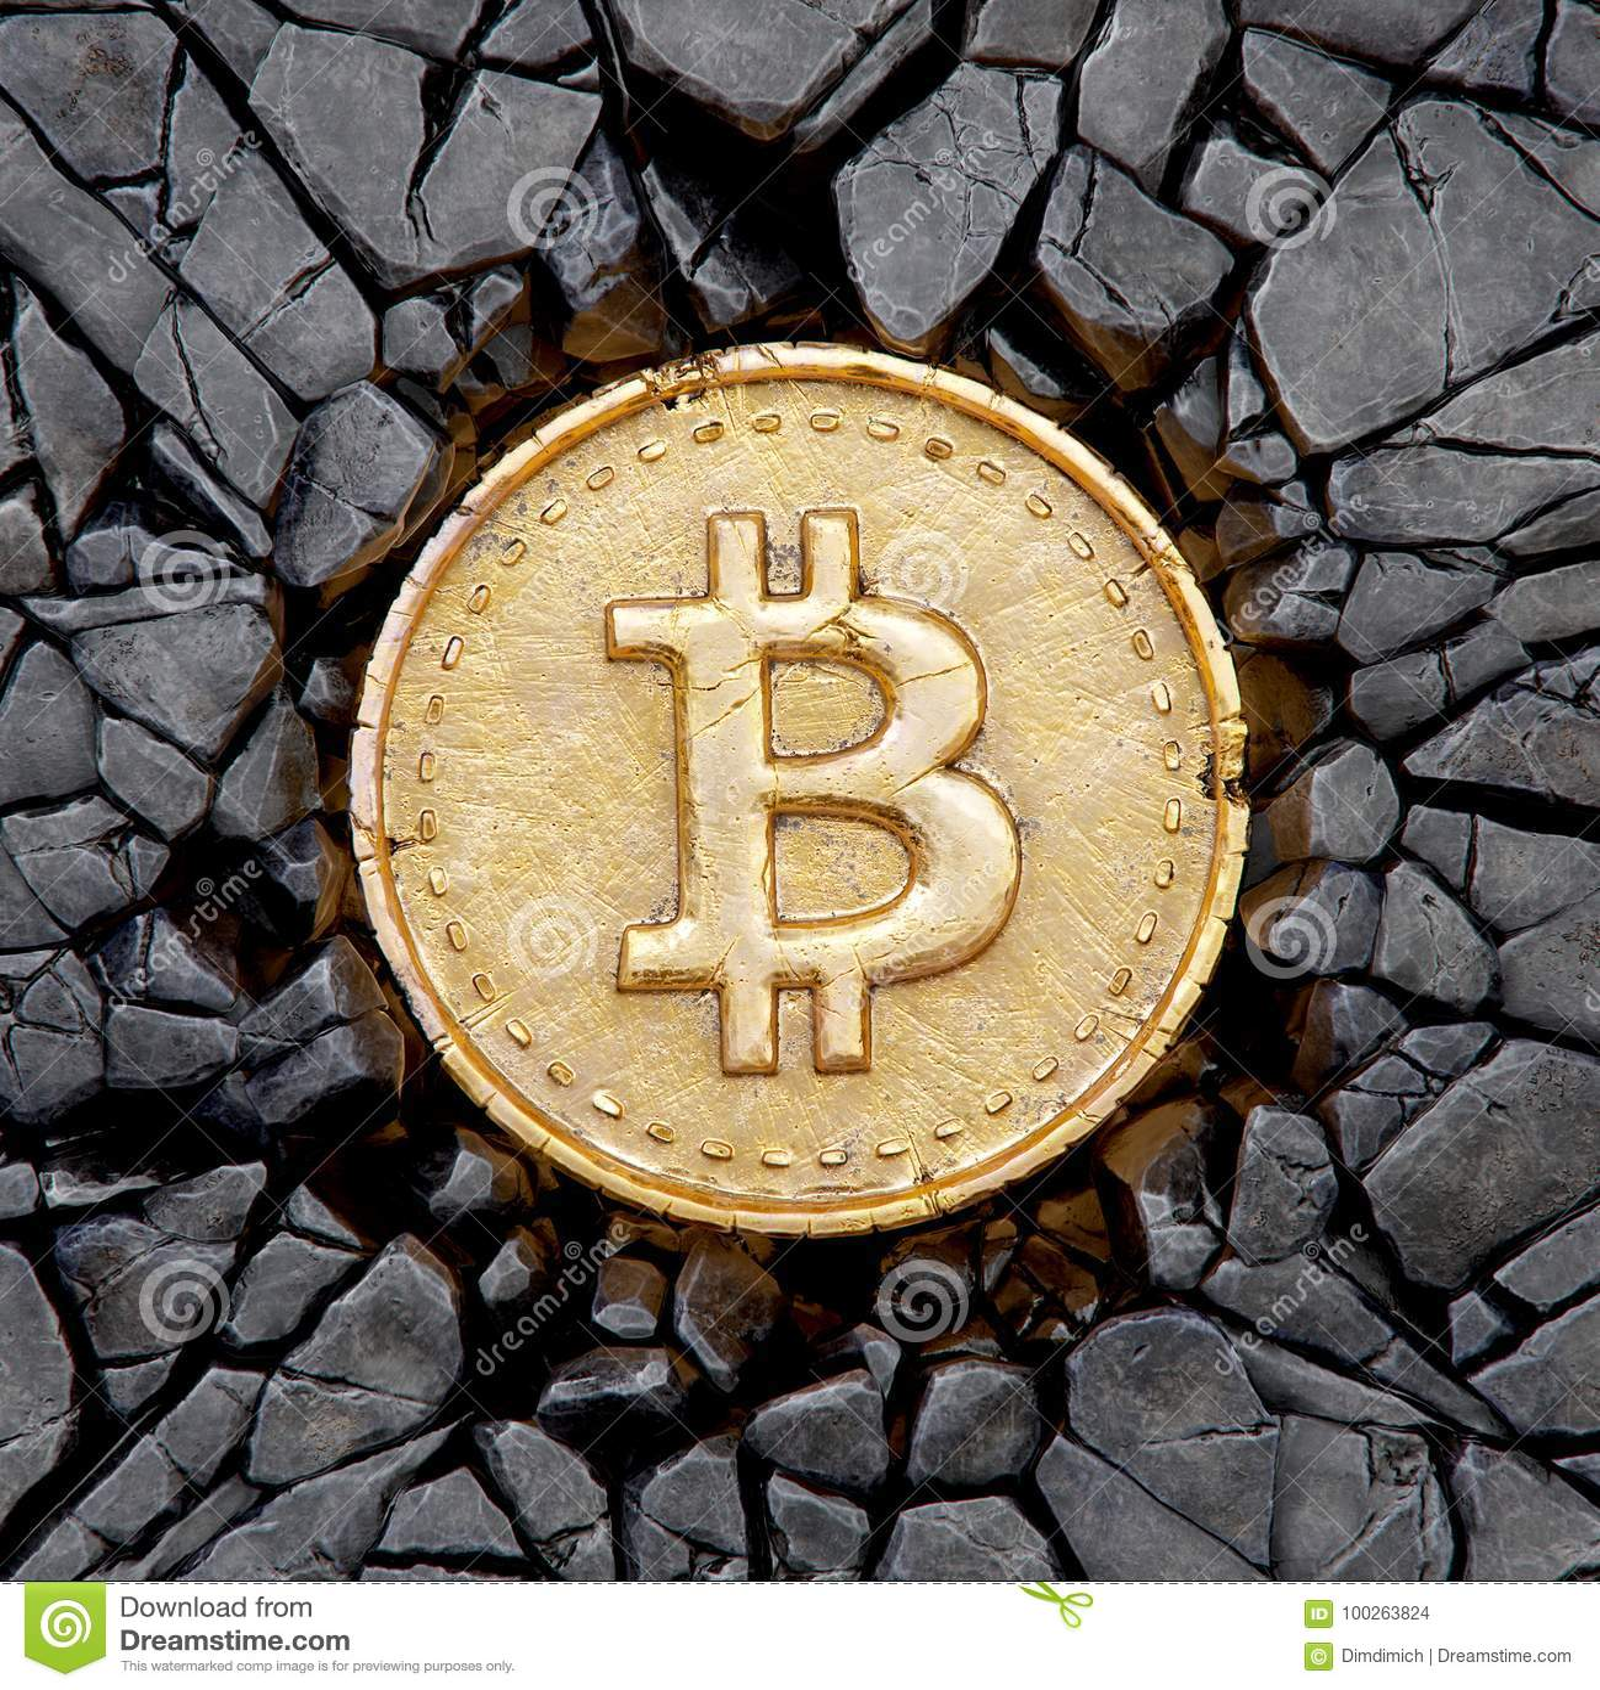 a rock bitcoin